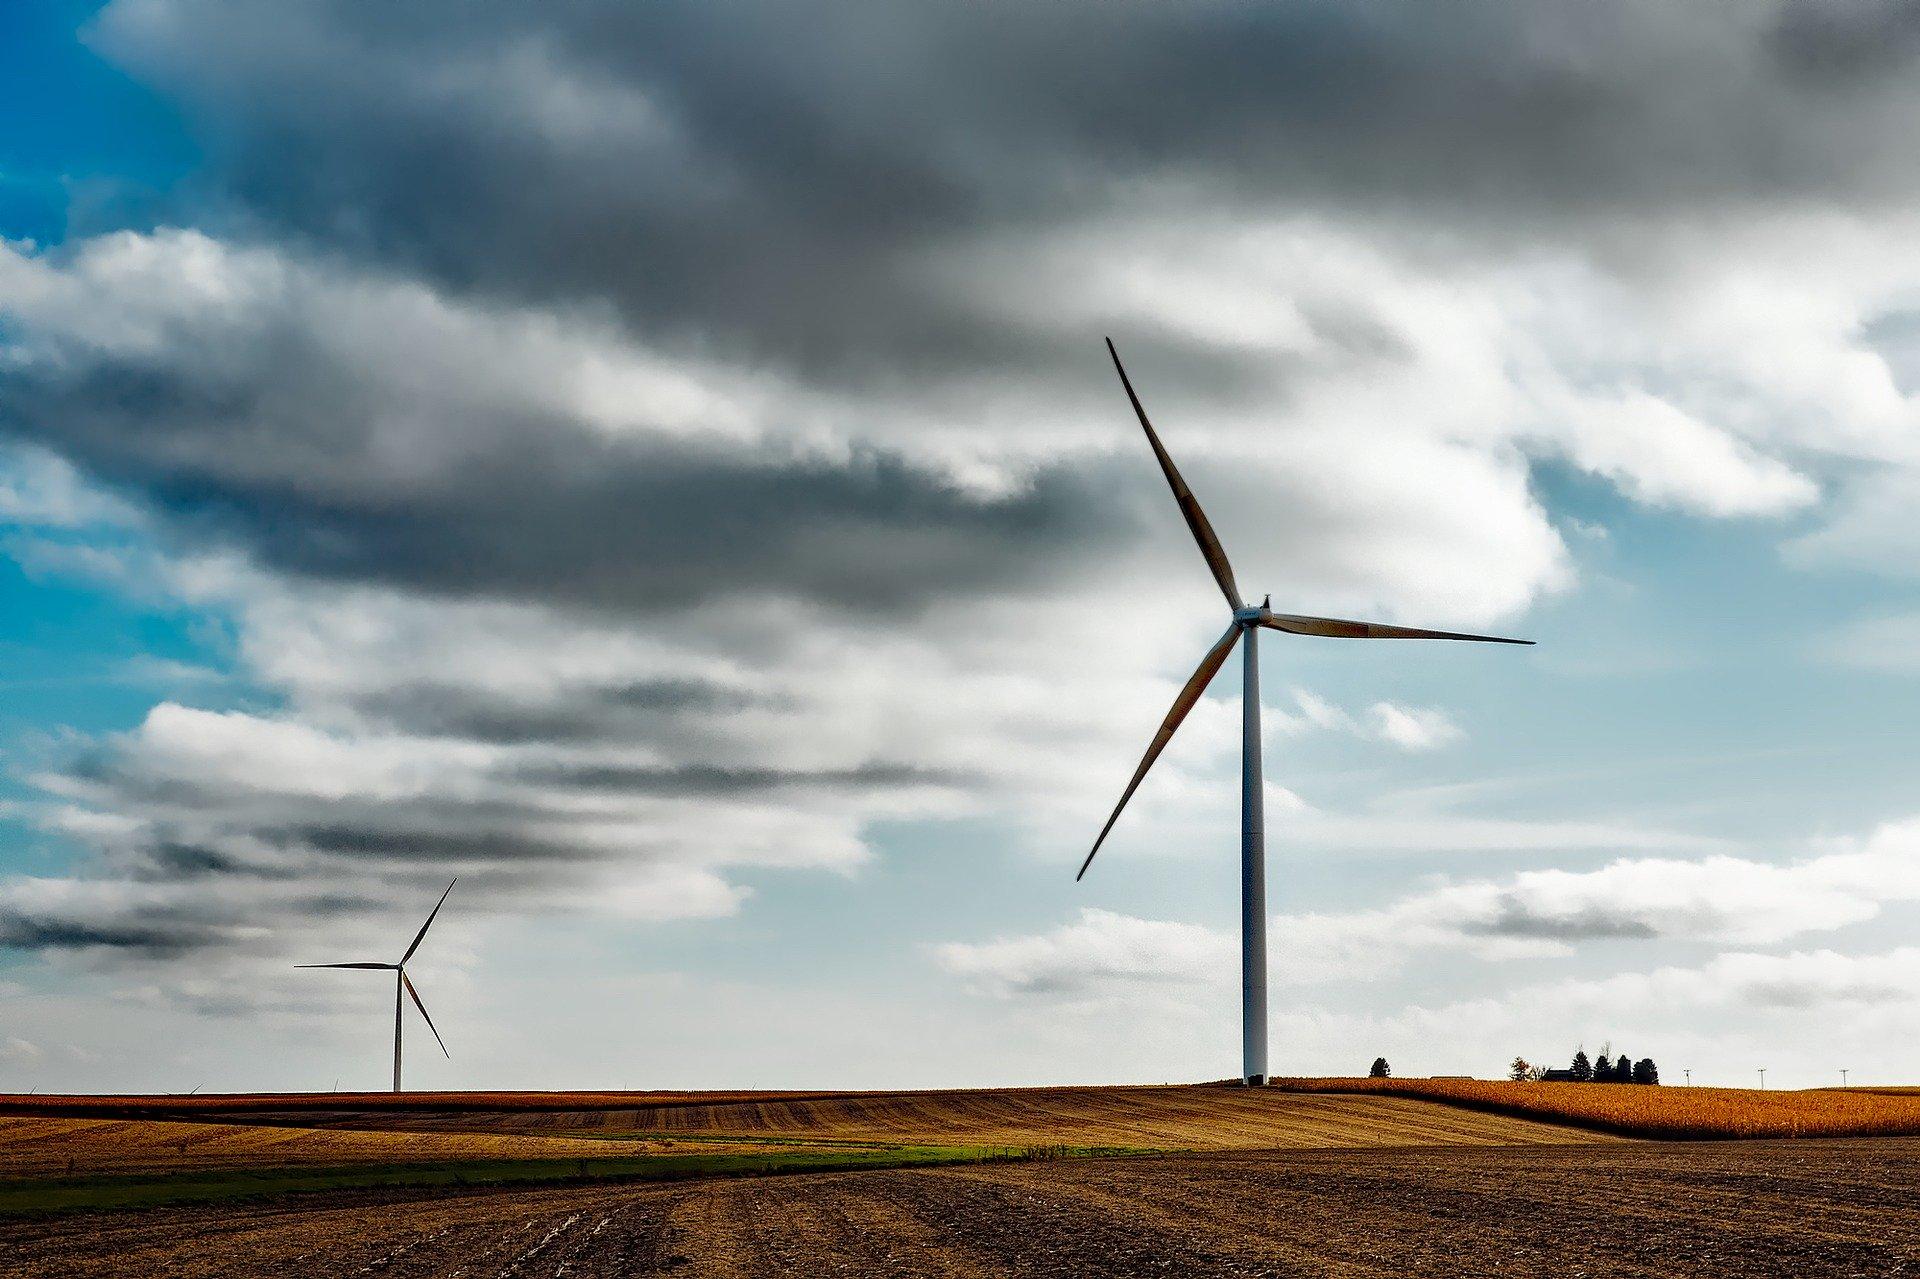 Bilan des énergies renouvelables en France en 2019